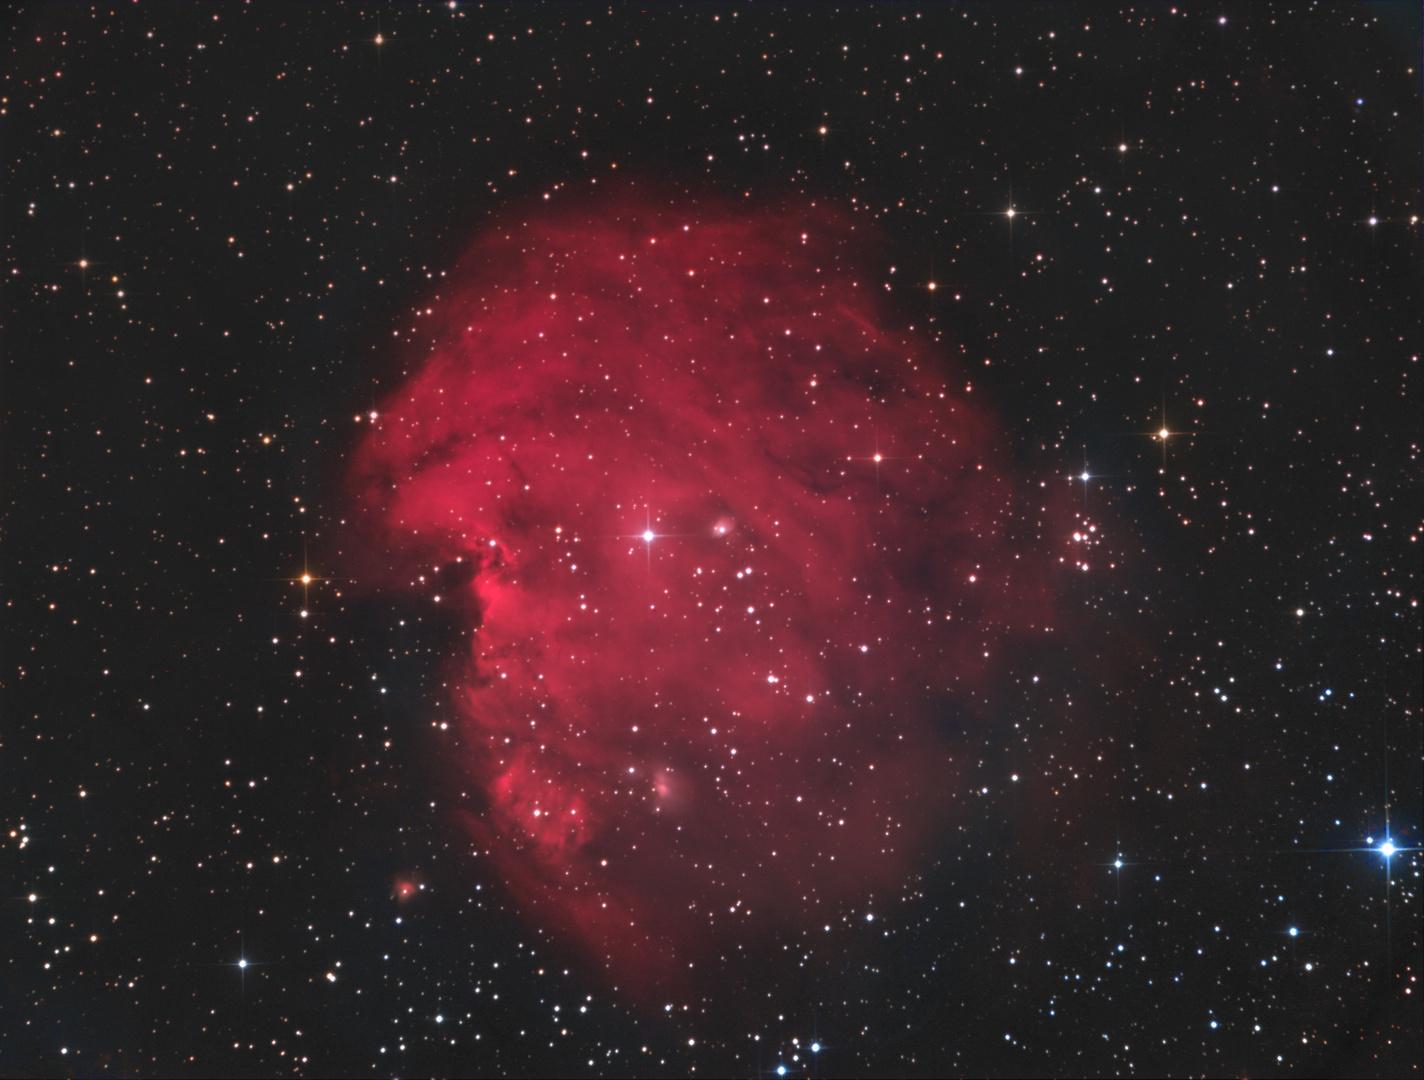 Der Affenkopf-Nebel NGC1274 im Sternbild Zwillinge